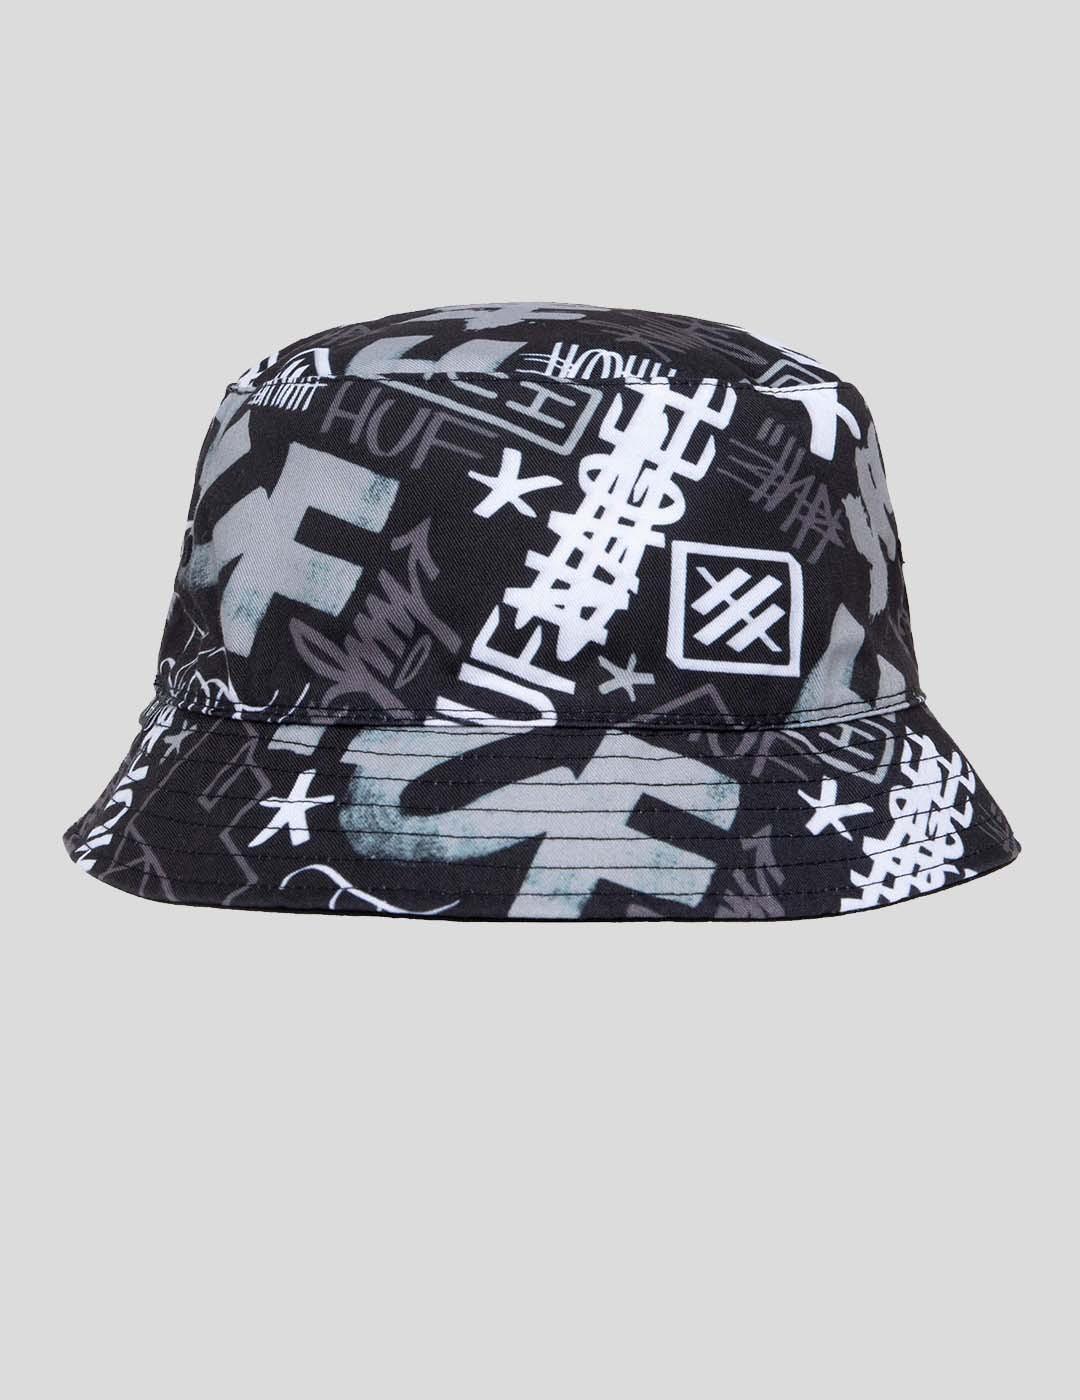 GORRA HUF HAZE BUCKET HAT BLACK